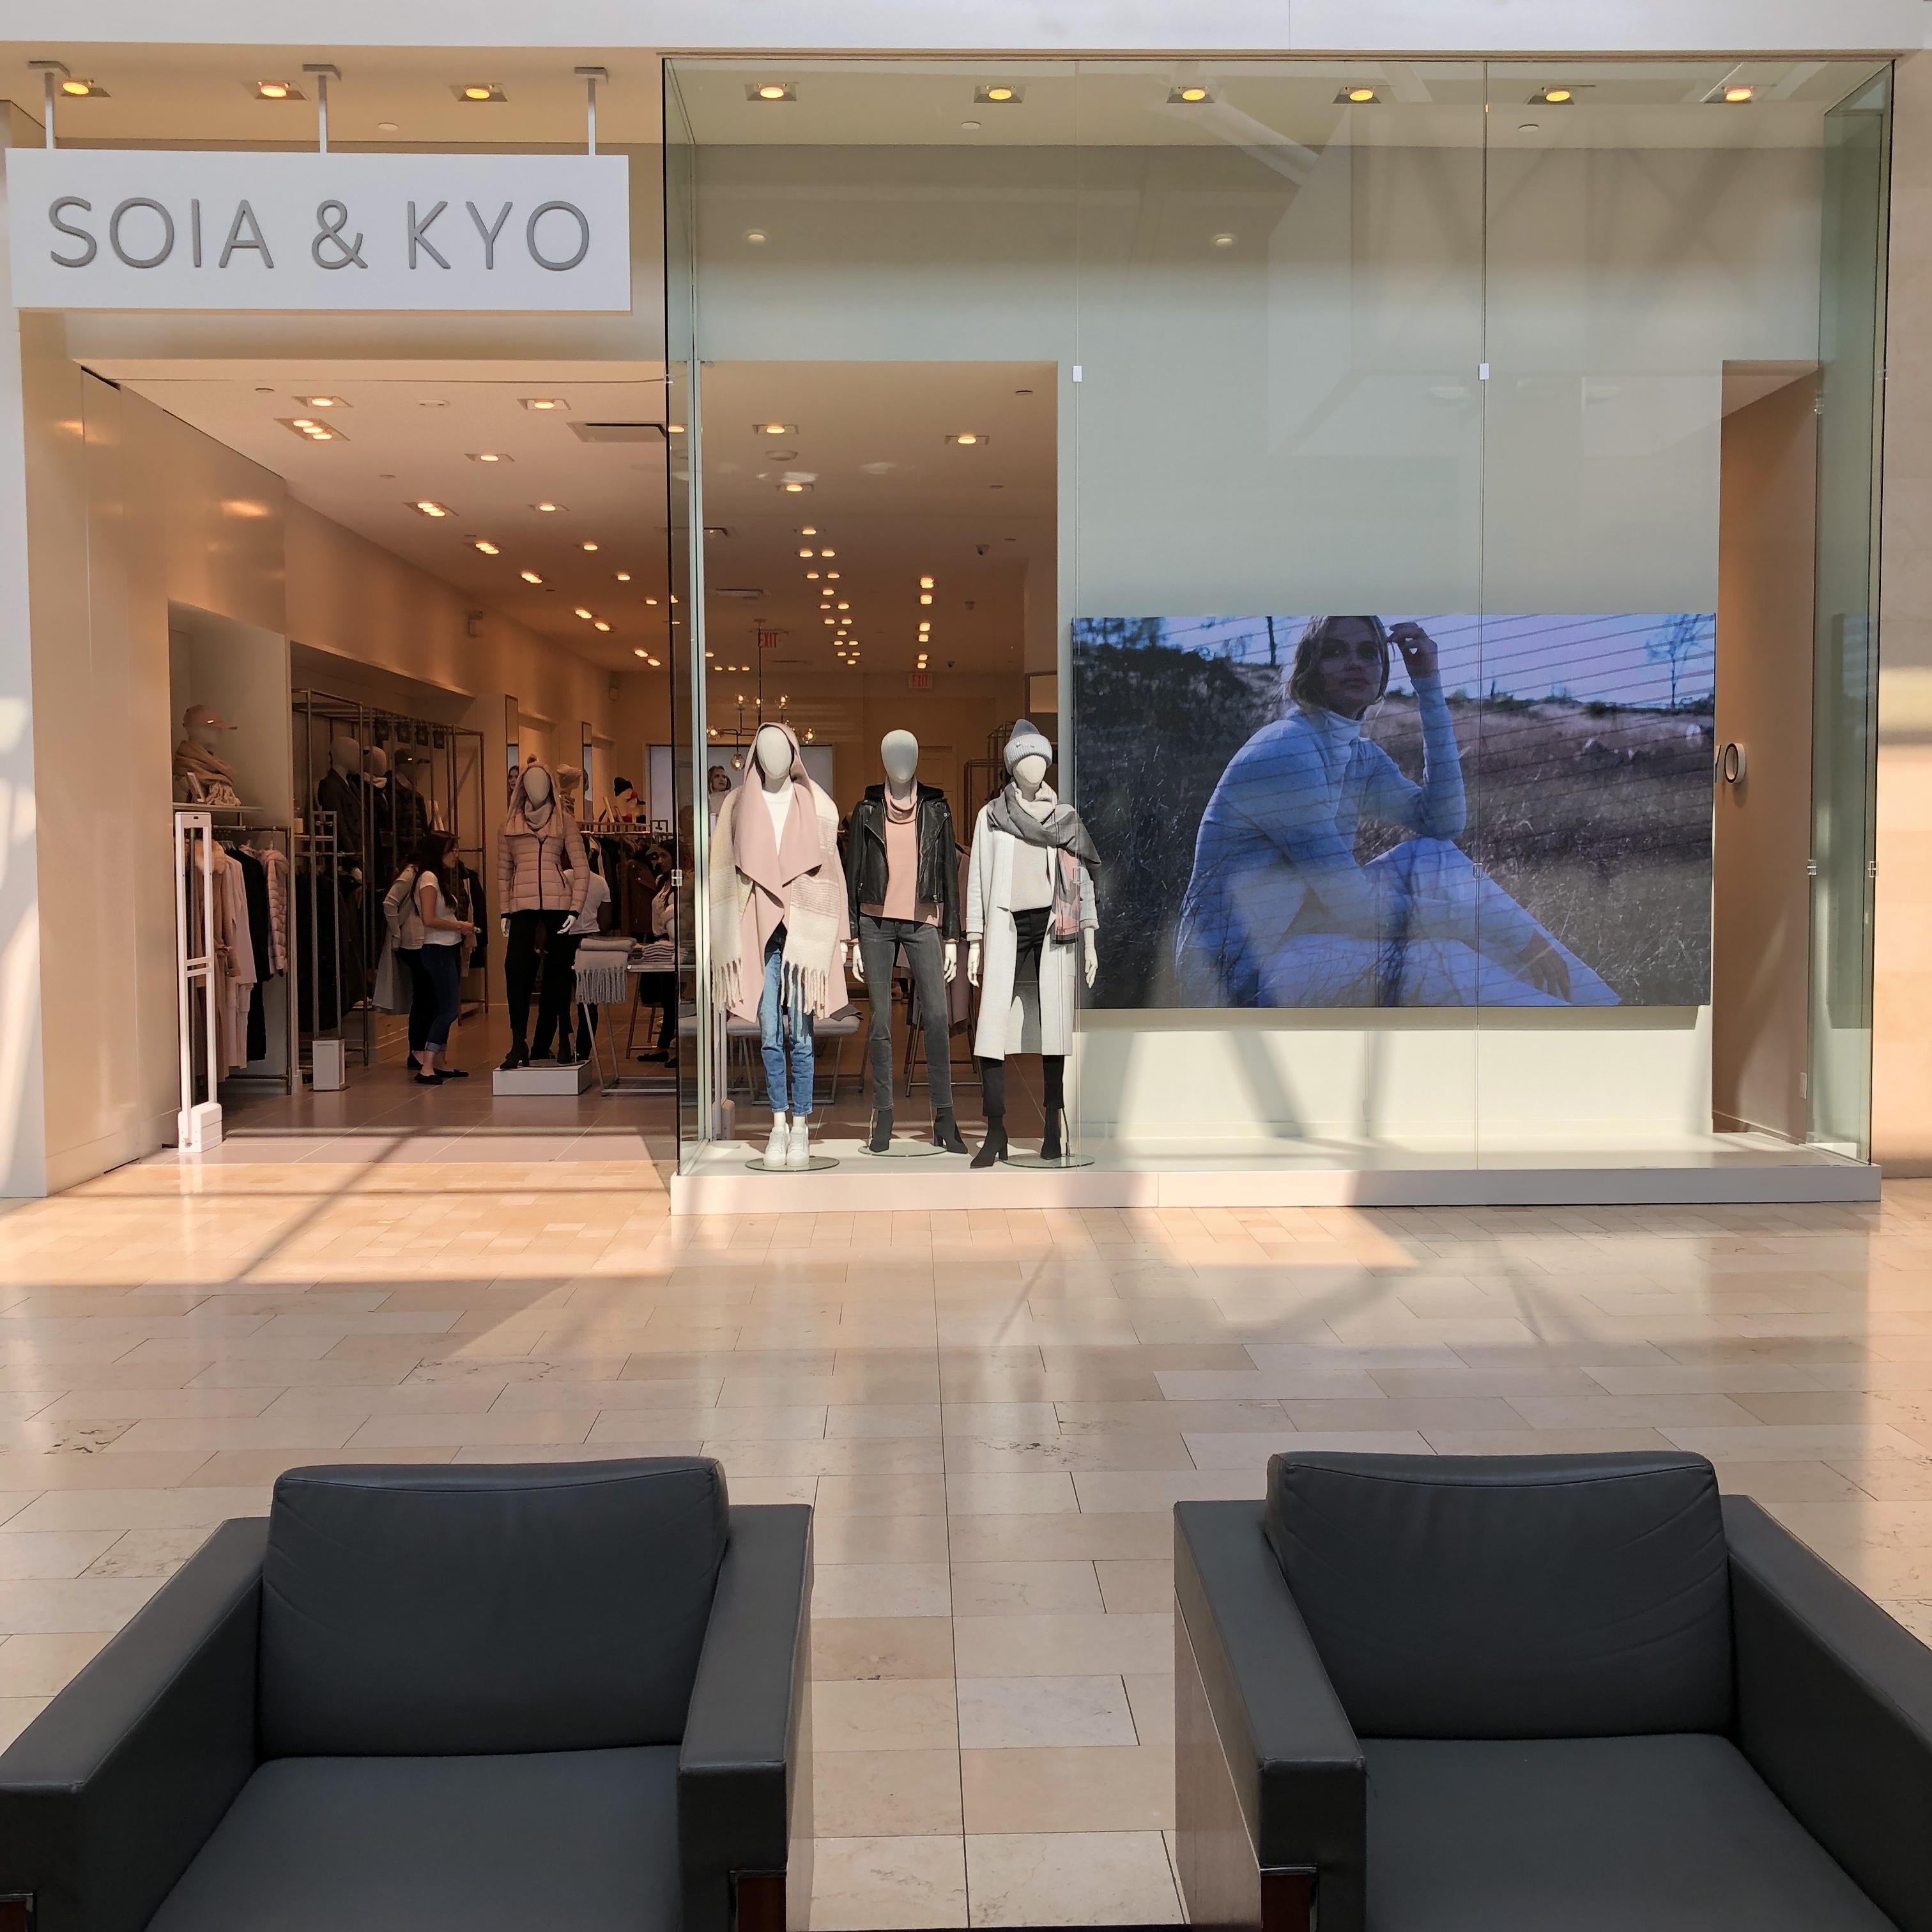 SOIA&KYO entrance signage